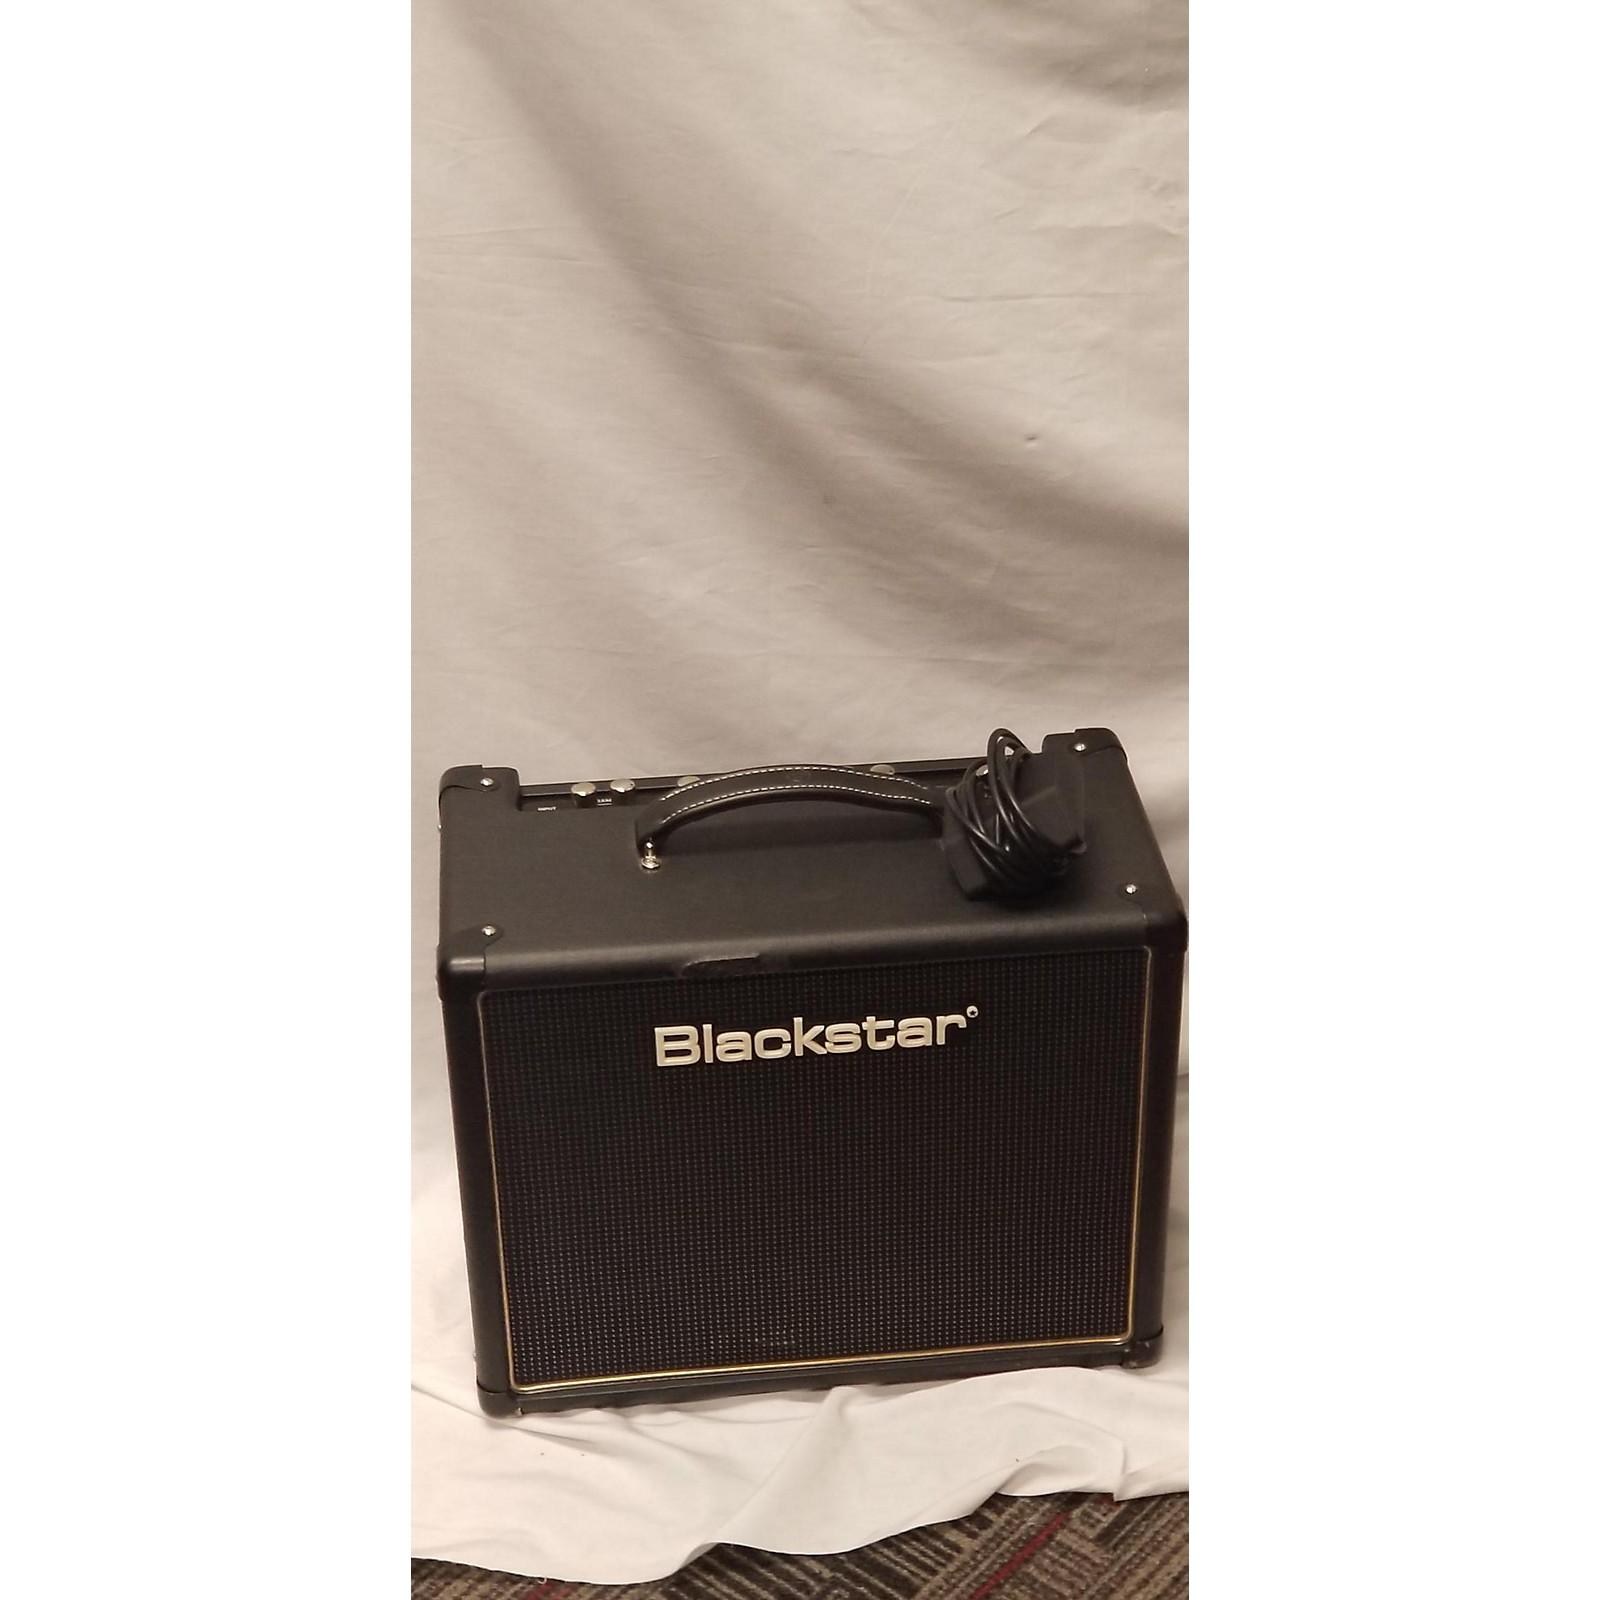 Blackstar HT5C IX12 Tube Guitar Combo Amp